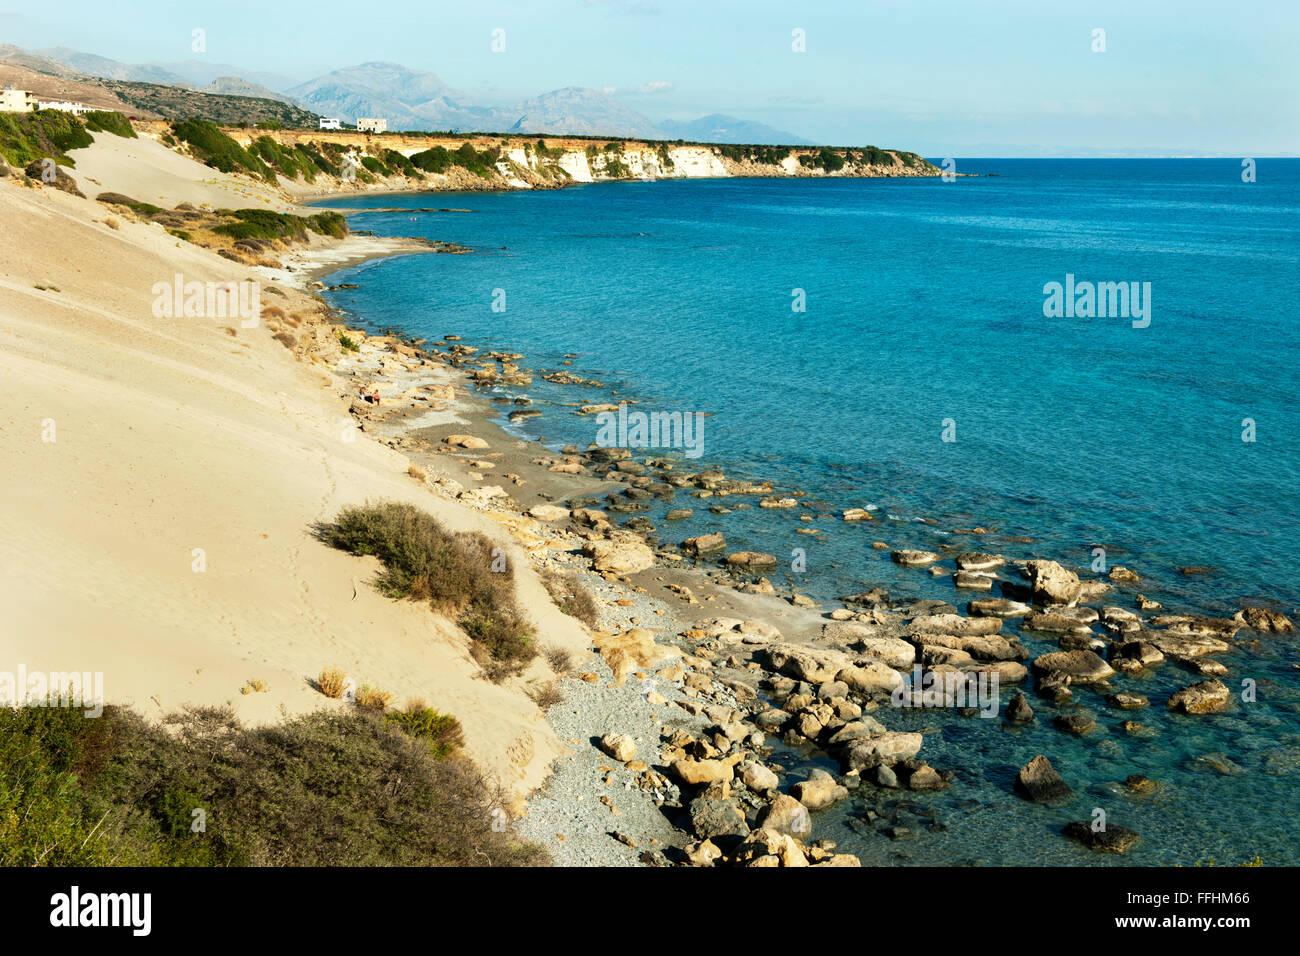 Griechenland, Kreta, Dünen-Strand Orthi Ammos, bei Frangokastello - Stock Image